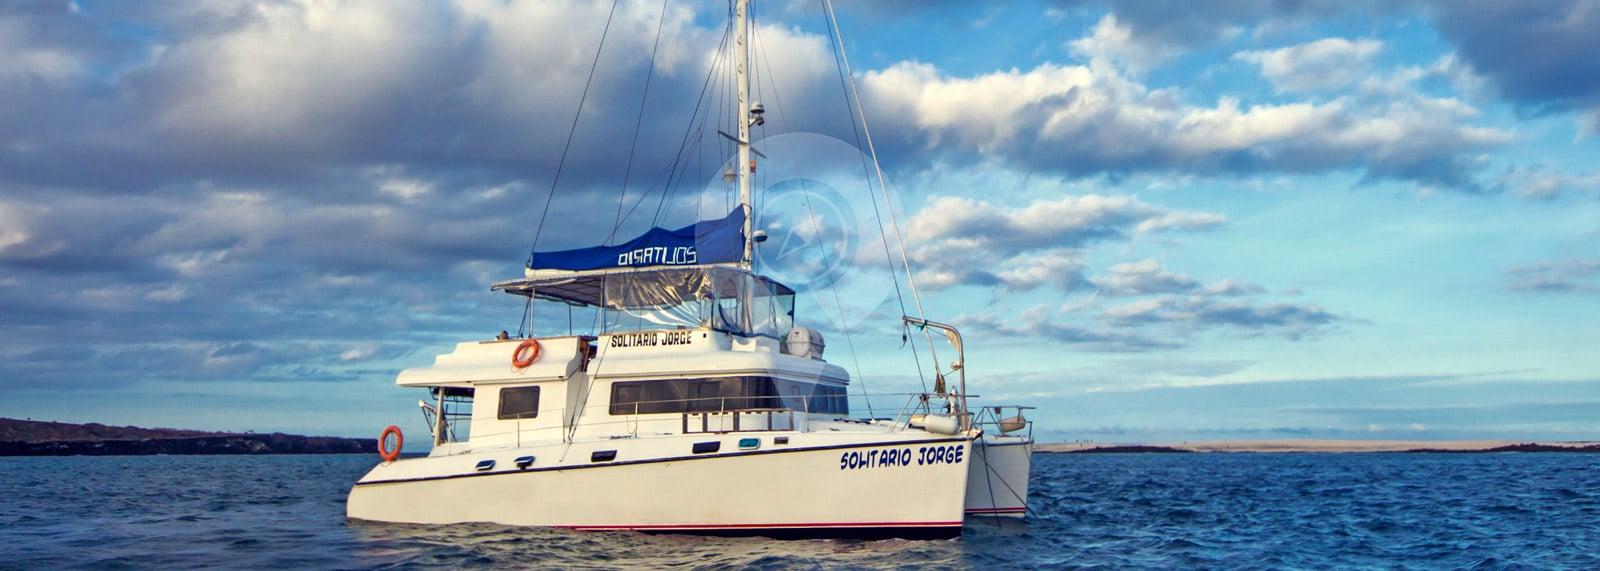 Catamaran Solitario Jorge Galapagos